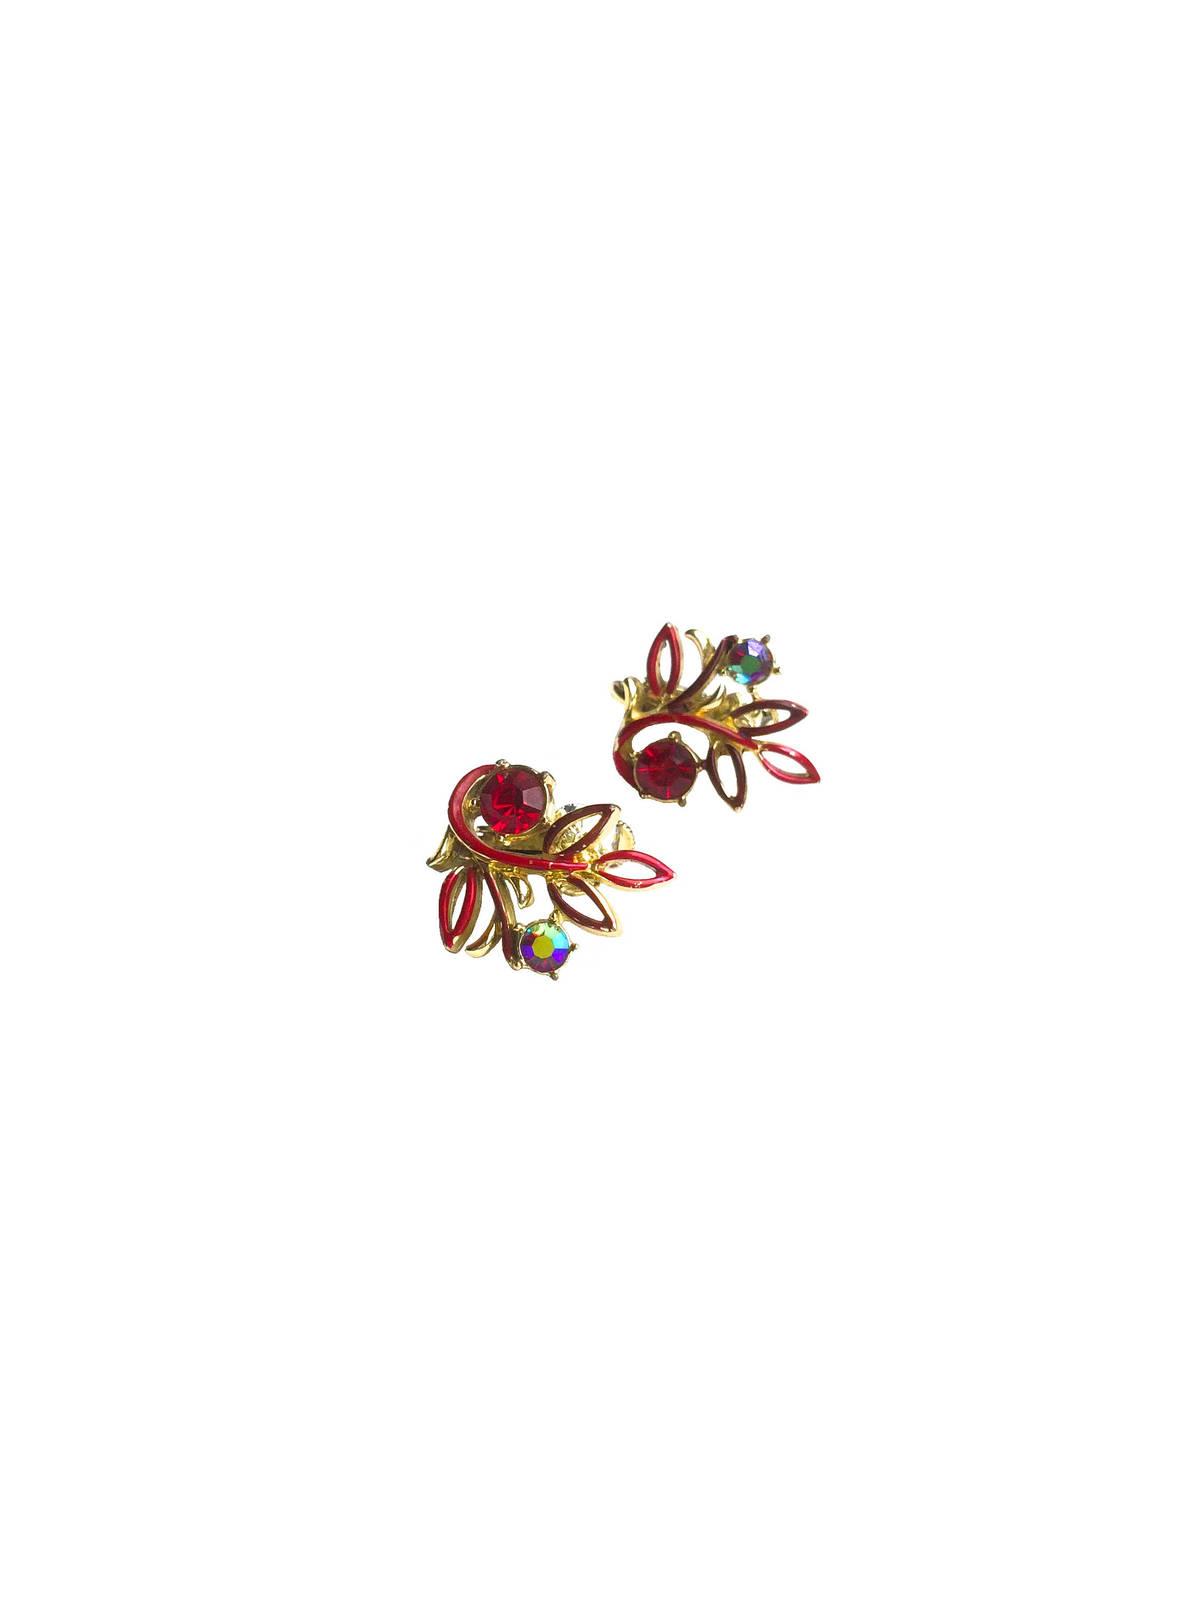 50s Corocraft Aurora Borealis Ruby Red Rhinestones Red Enamel clip on earrings s